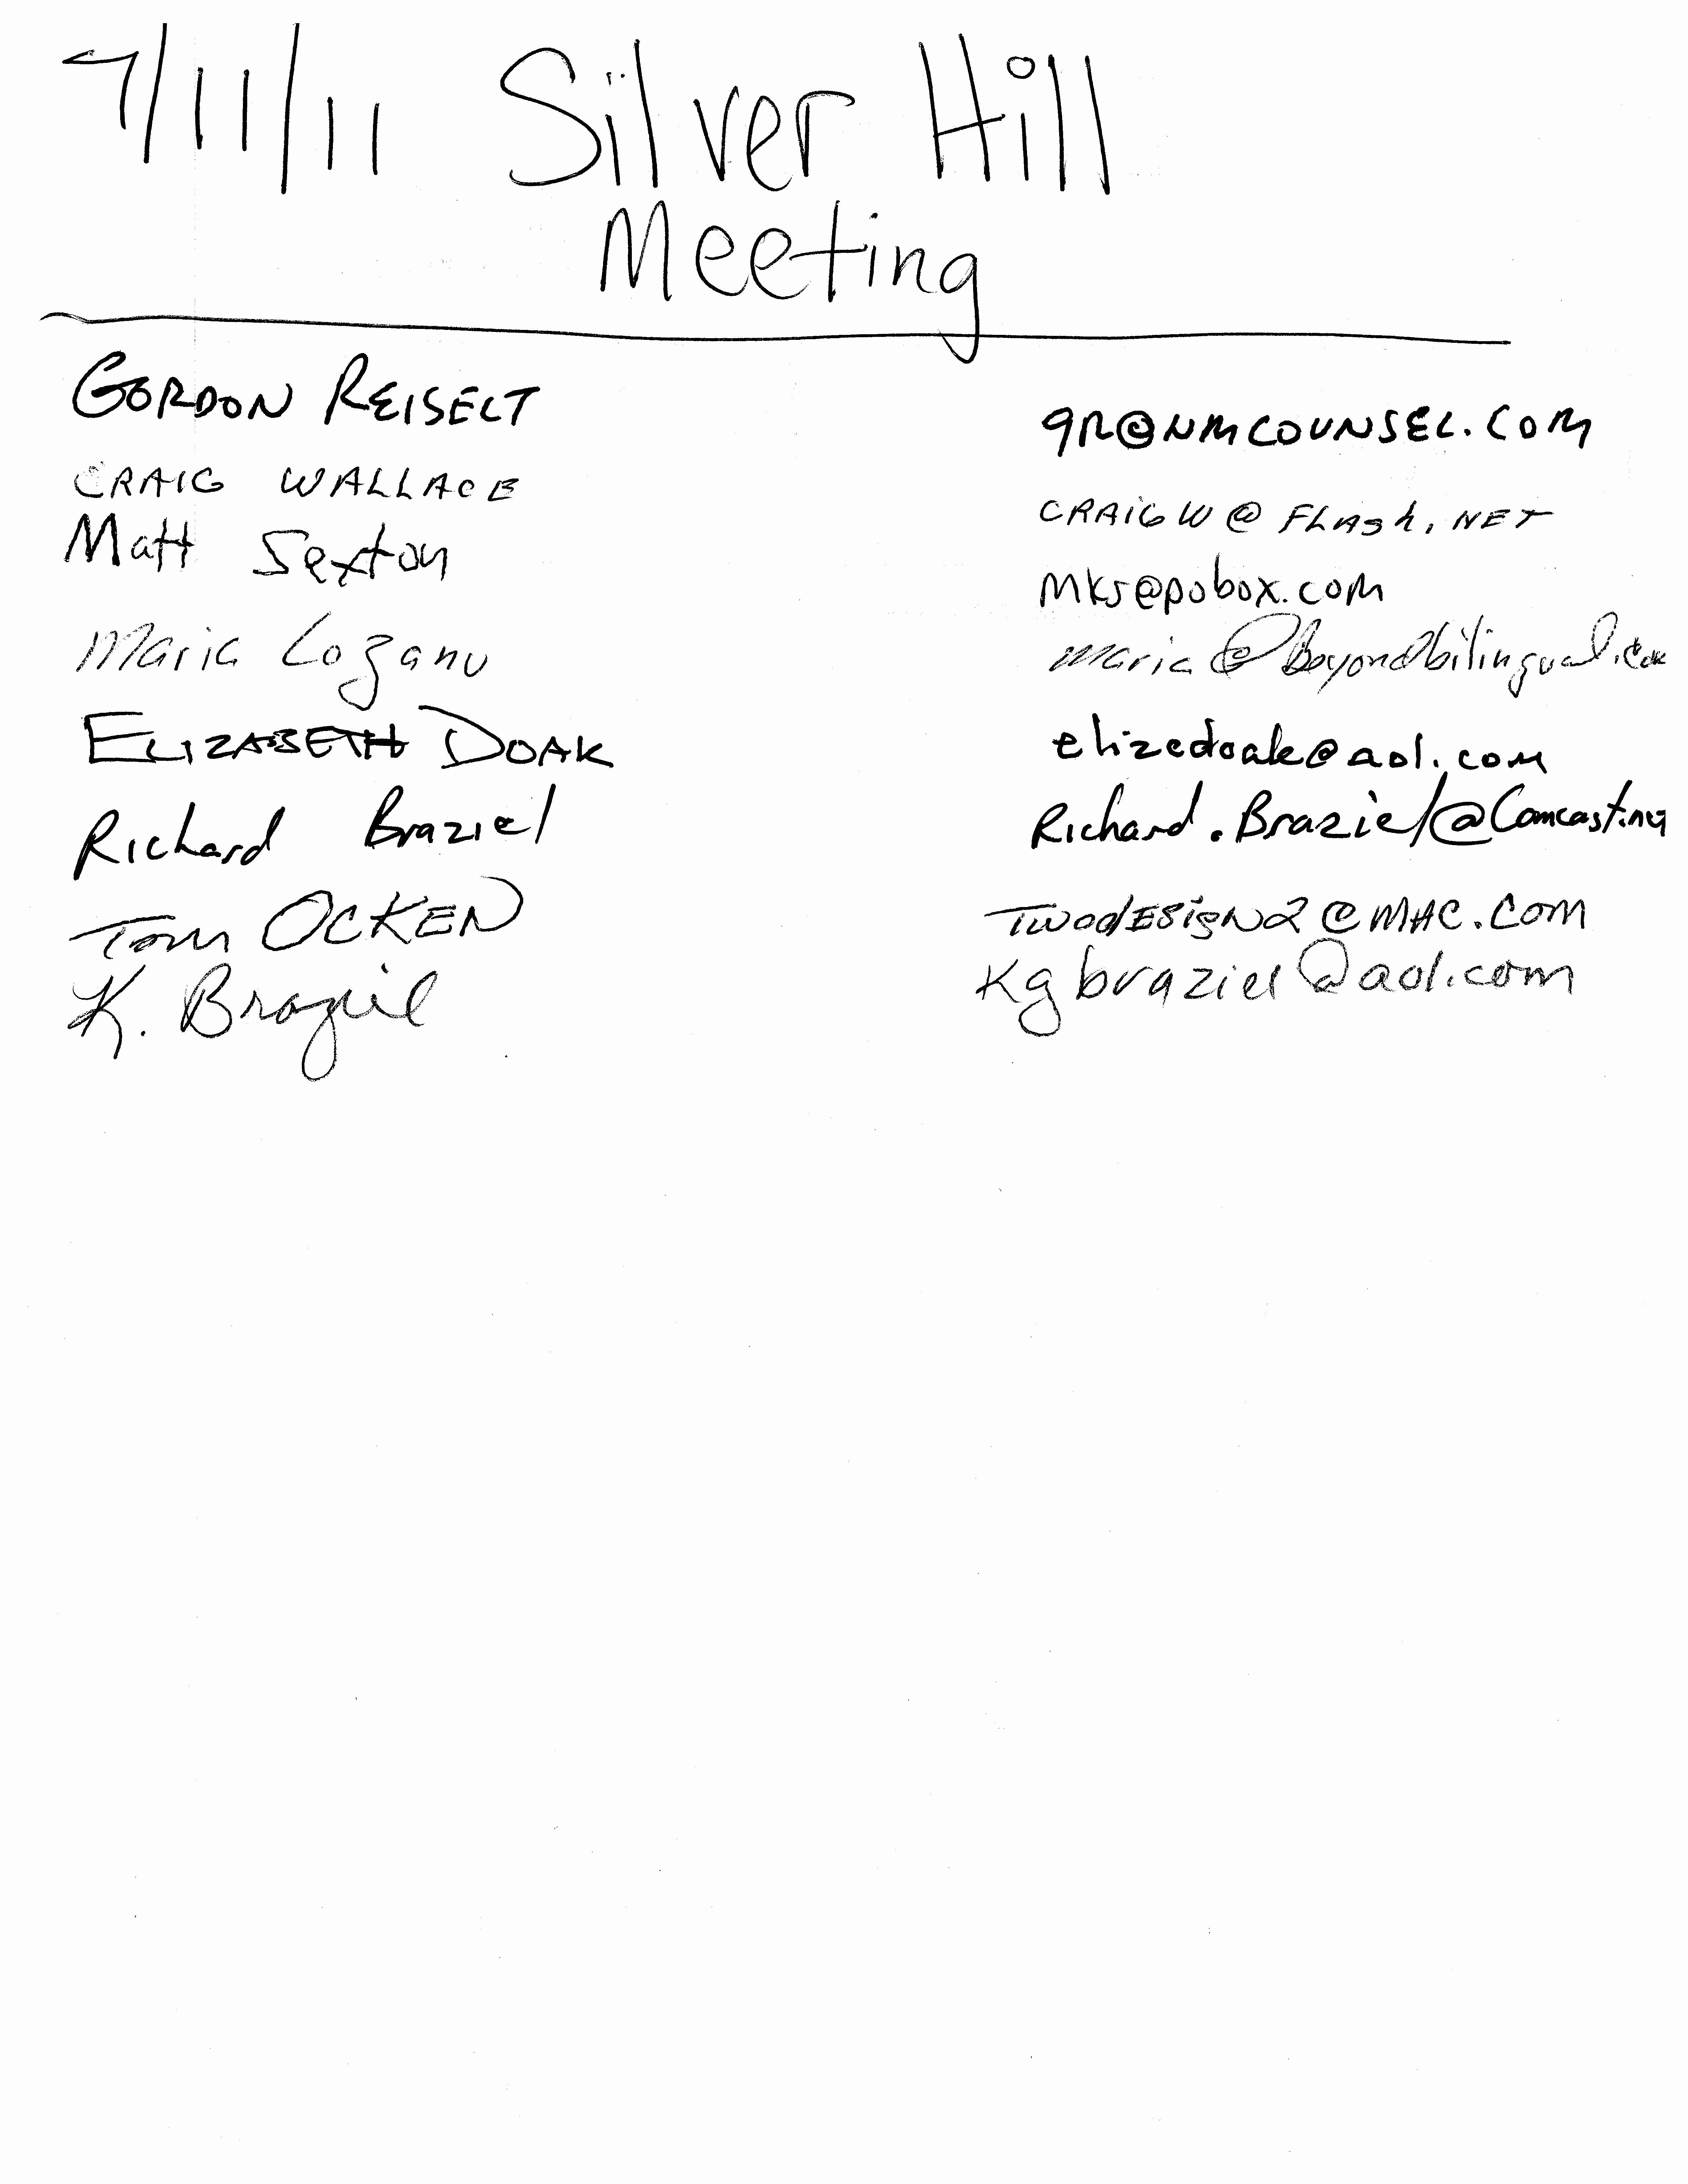 Board Meeting Sign In Sheet Beautiful Shna Meeting Minutes – 7 11 11